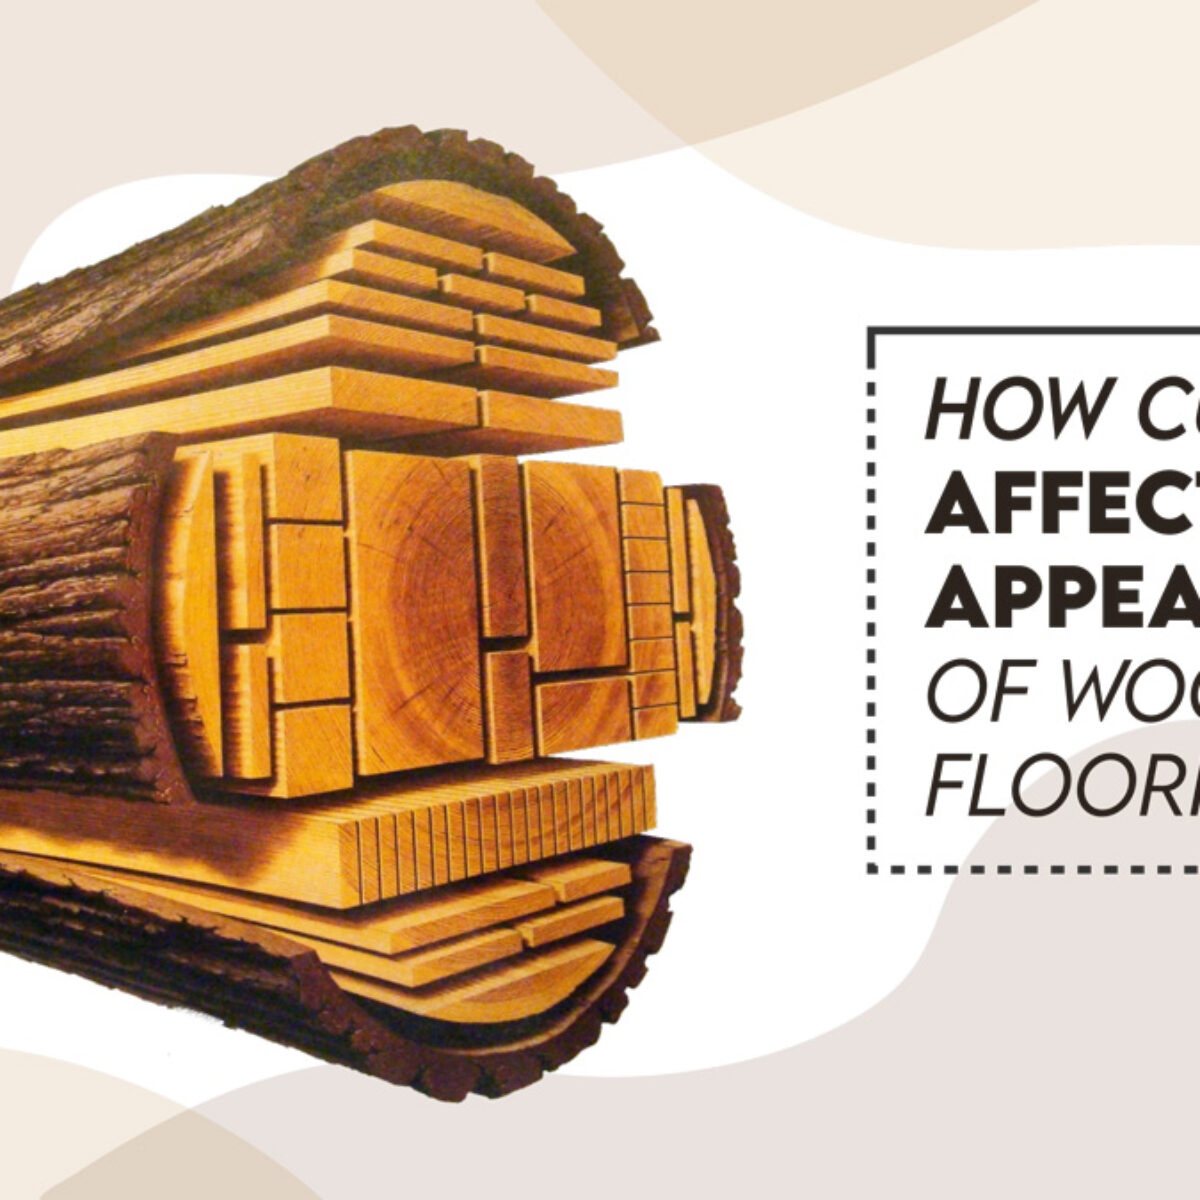 CEU course how cuts affect appearance of wood floorin